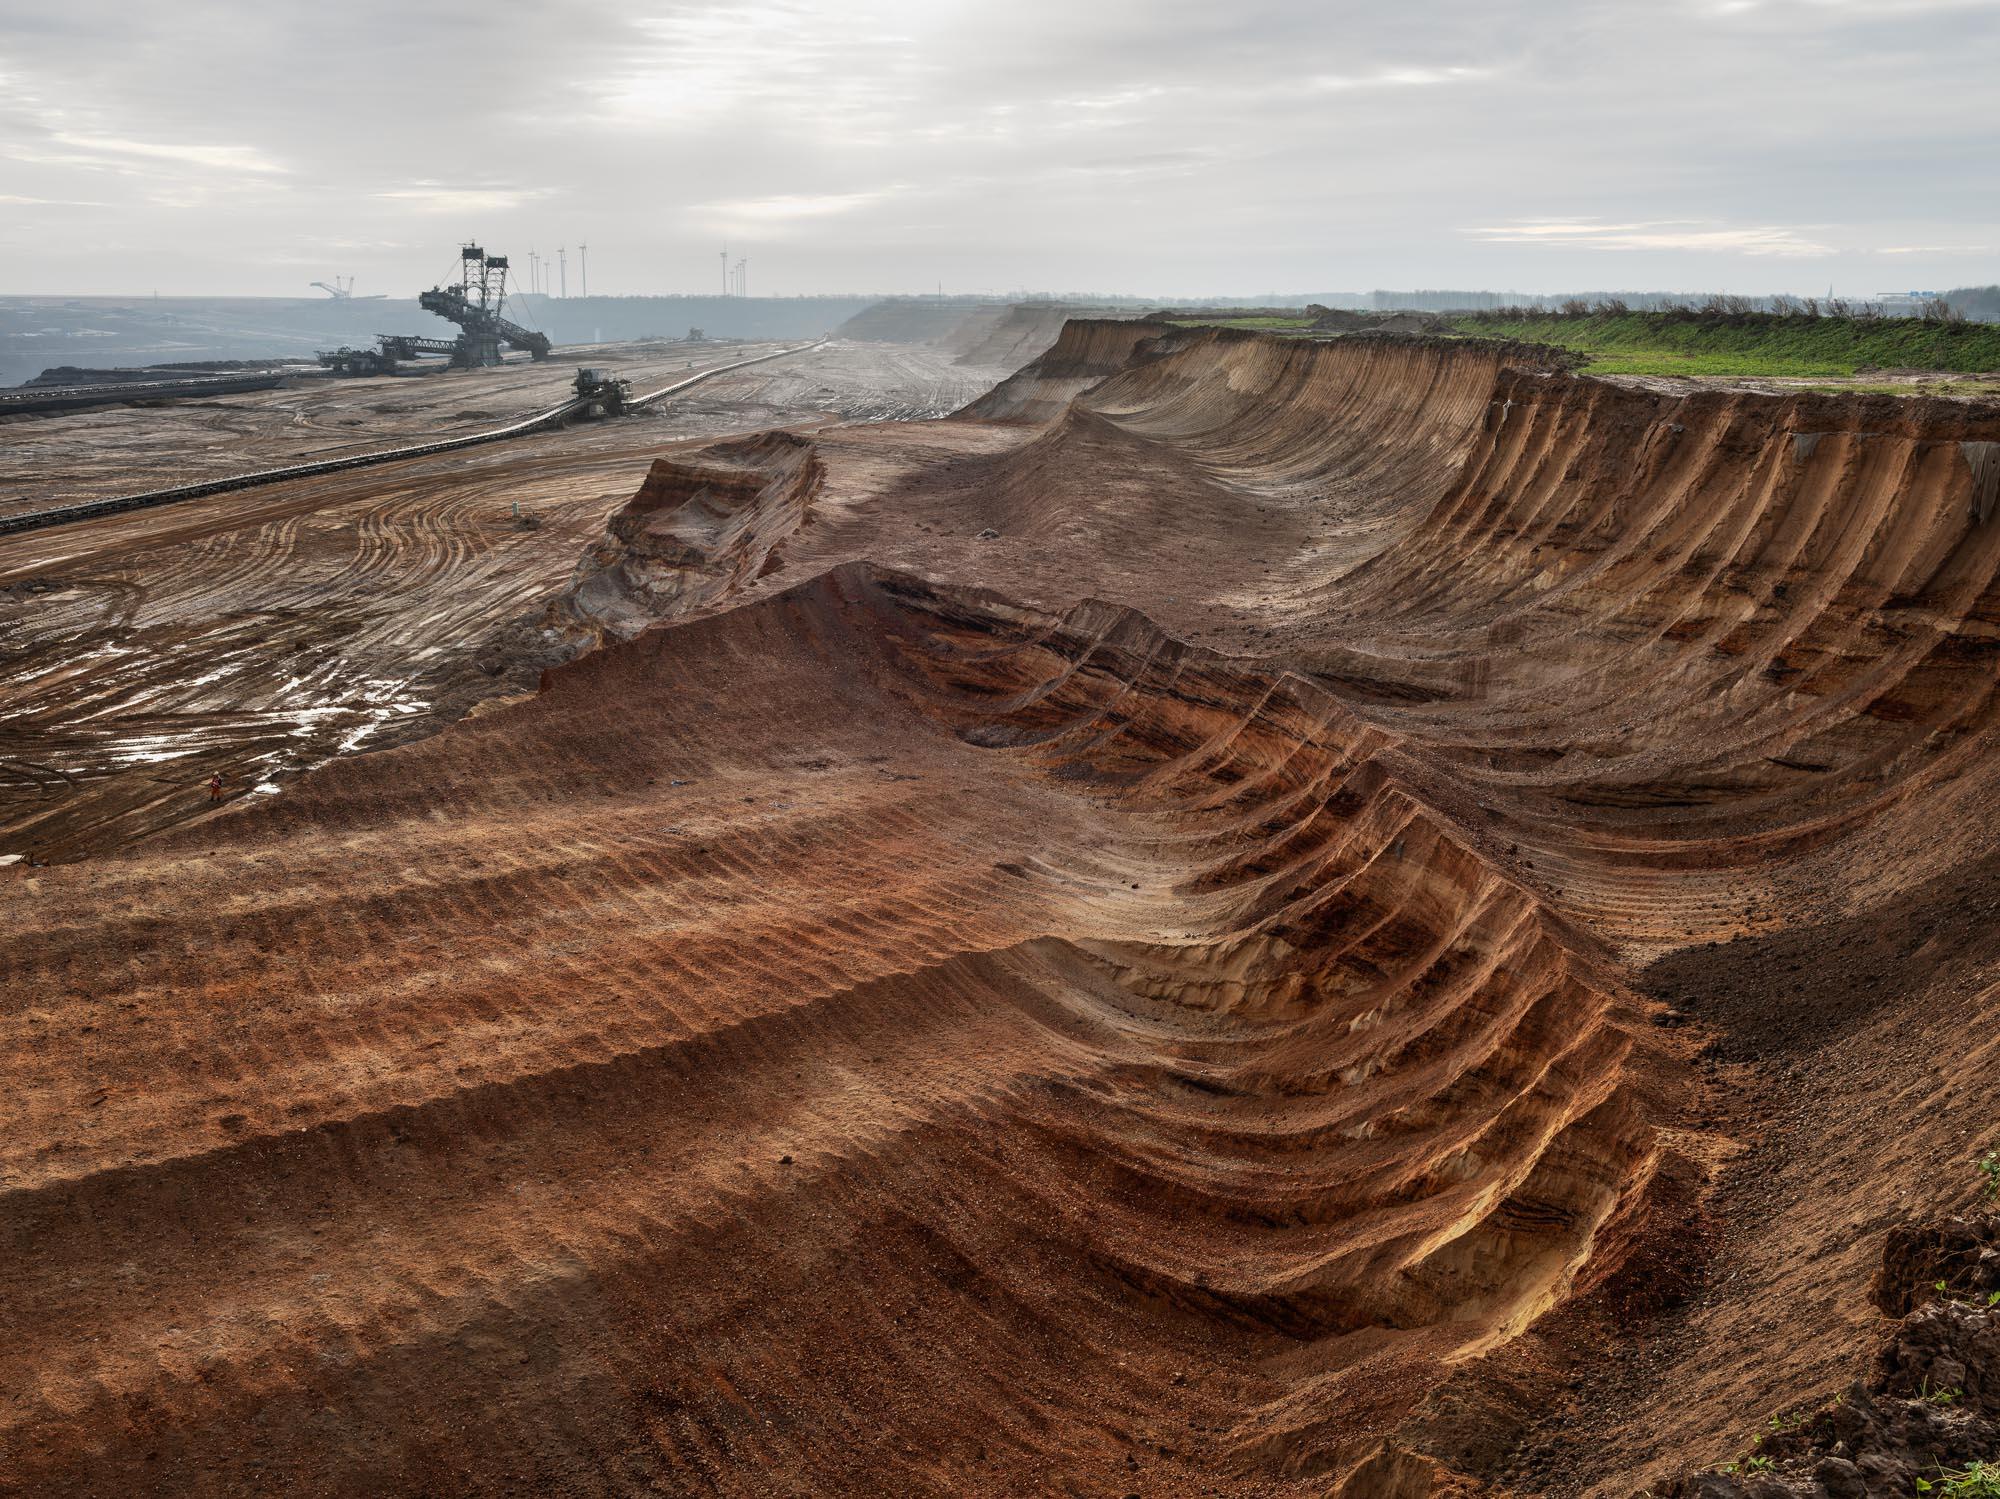 Coal Mine #1, North Rhine, Westphalia, Germany 2015 © Edward Burtynsky, courtesy Flowers Gallery, London / Howard Greenberg and Bryce Wolkowitz Galleries, New York